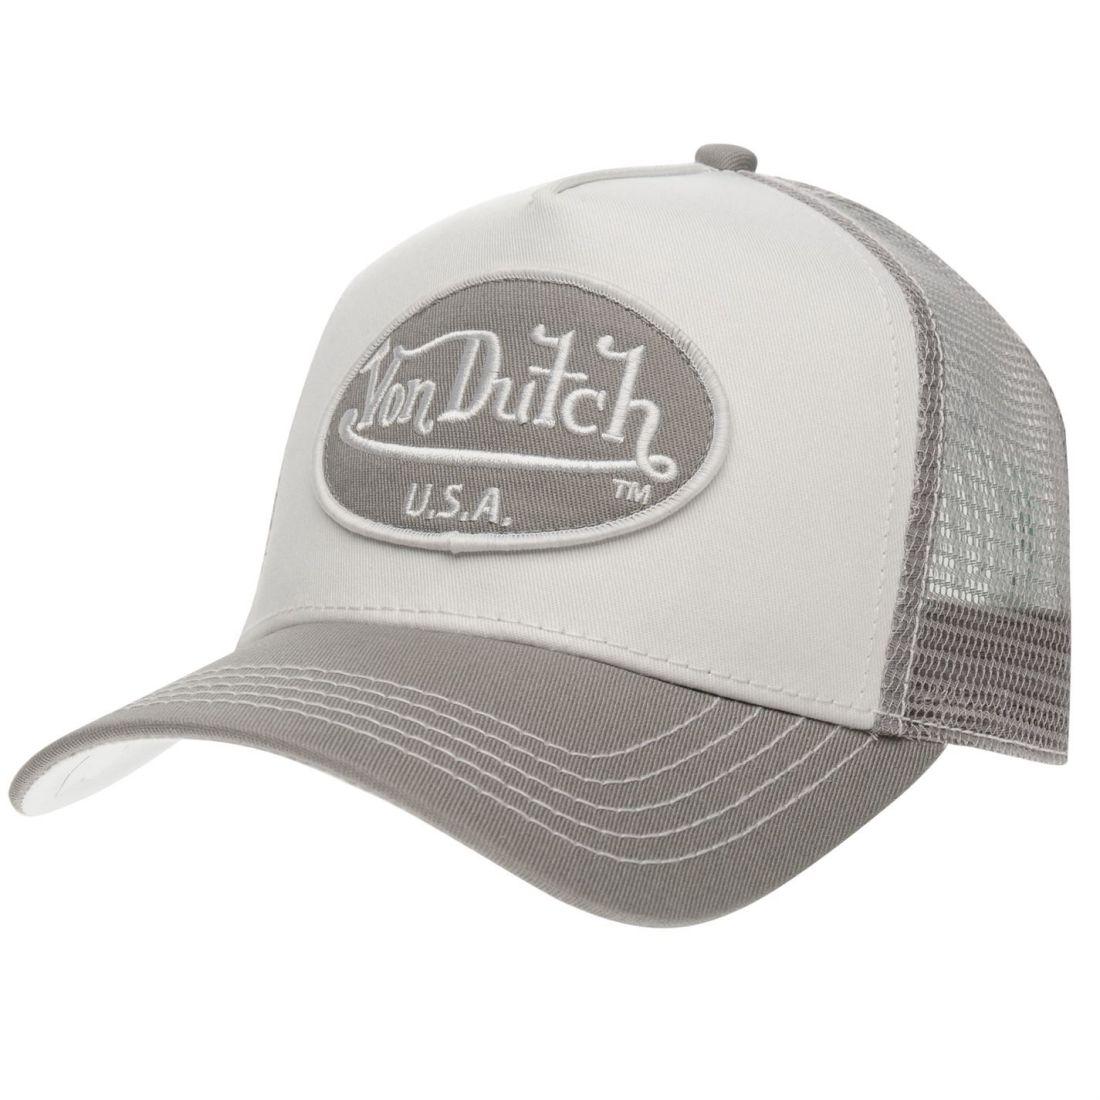 Mens Von Dutch Logo Cap Baseball New  14adca9530d1